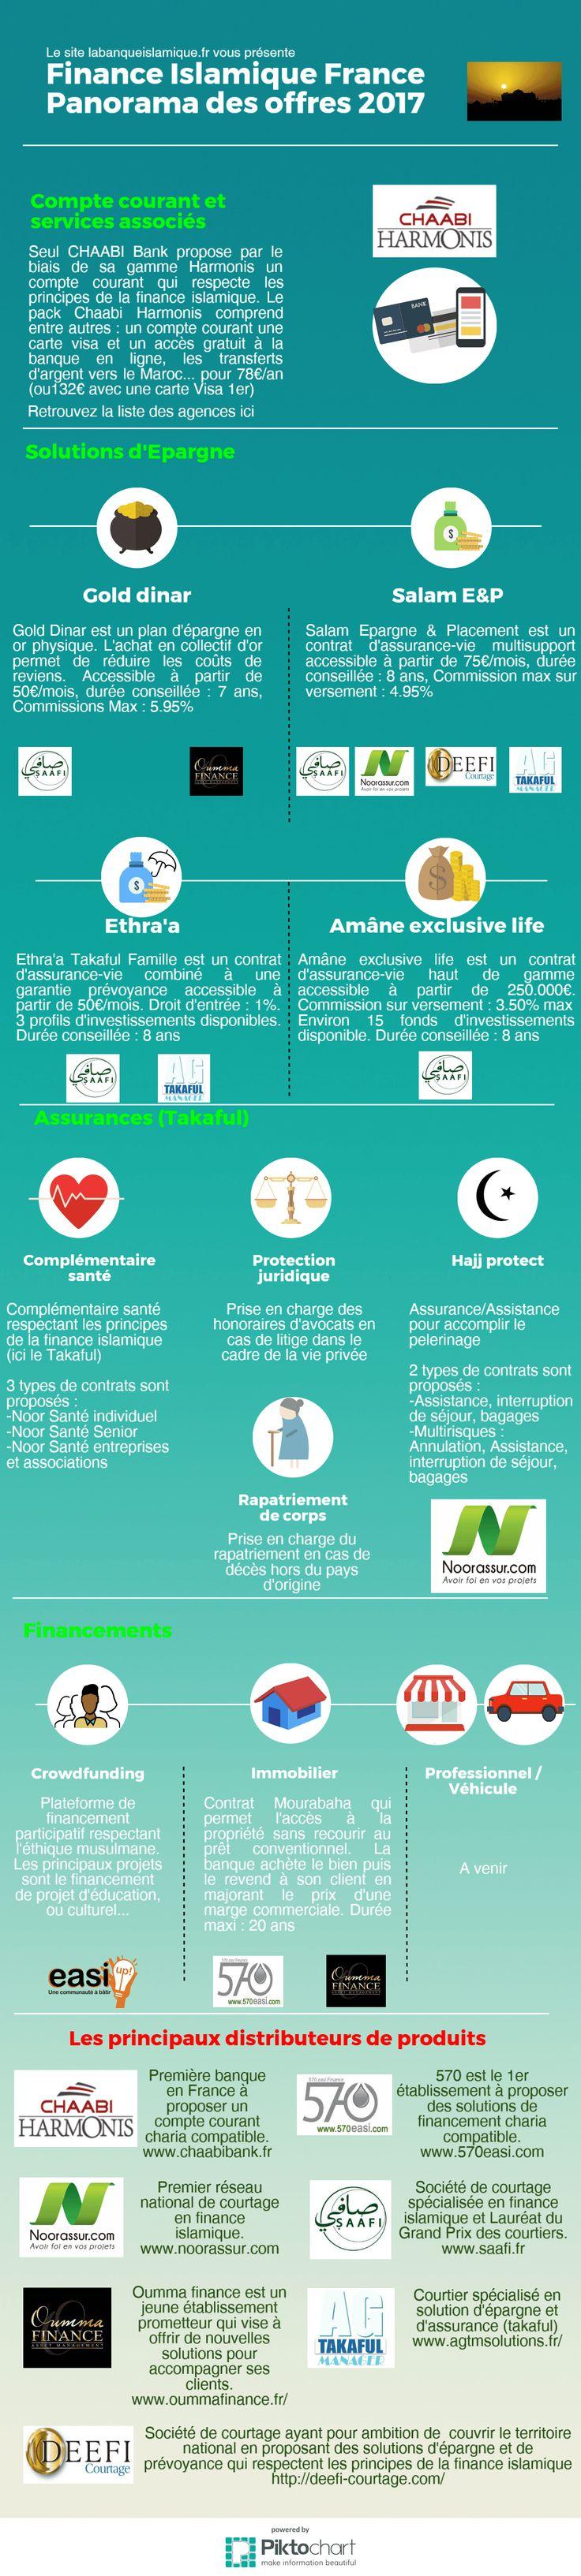 Panorama 2017 de la finance islamique en France